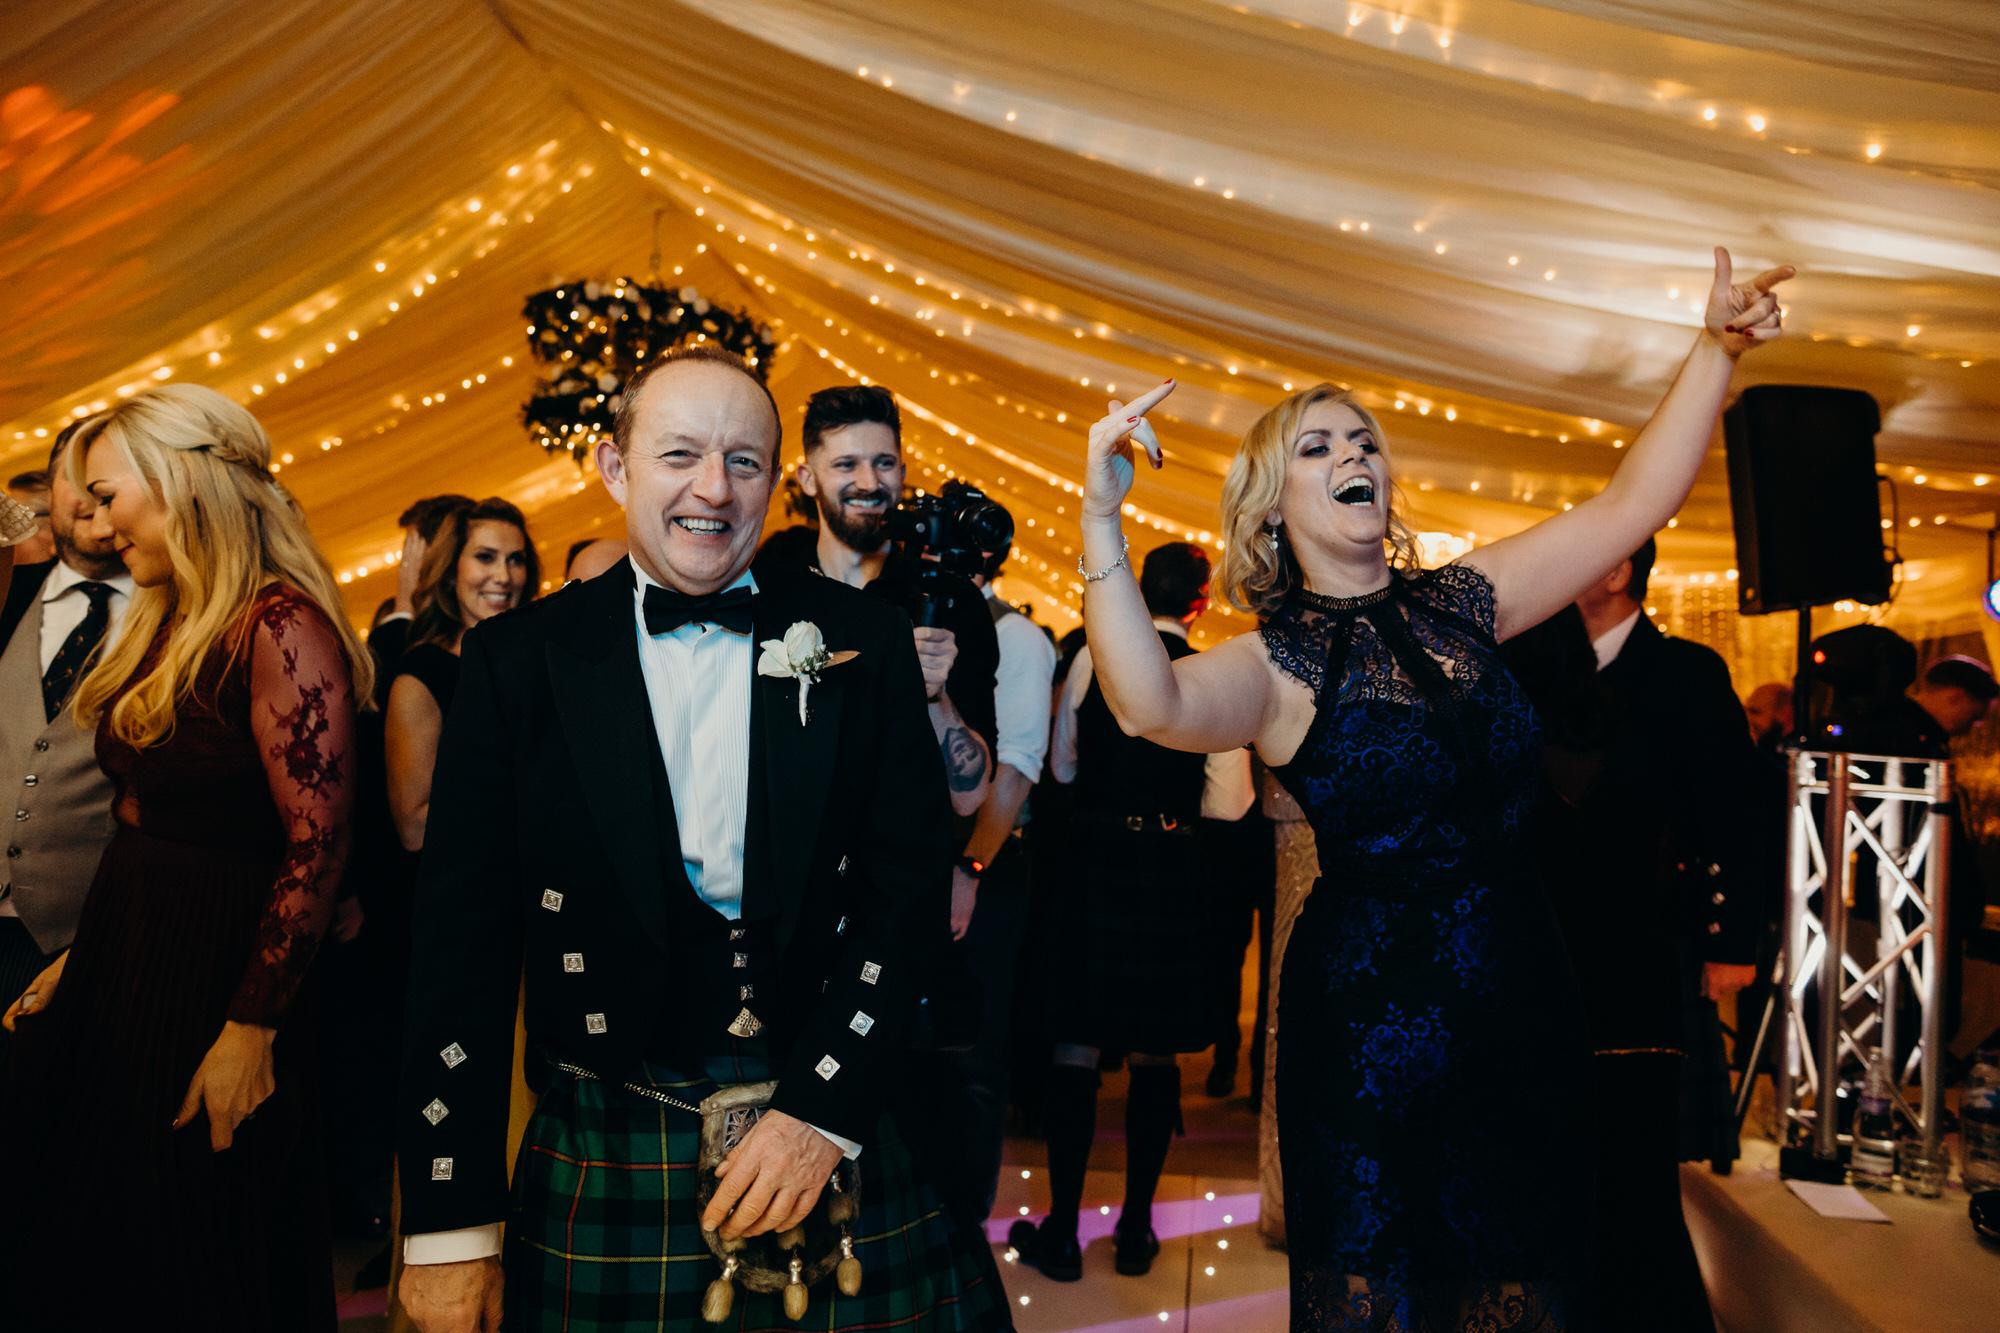 Dancing at Duntreath wedding